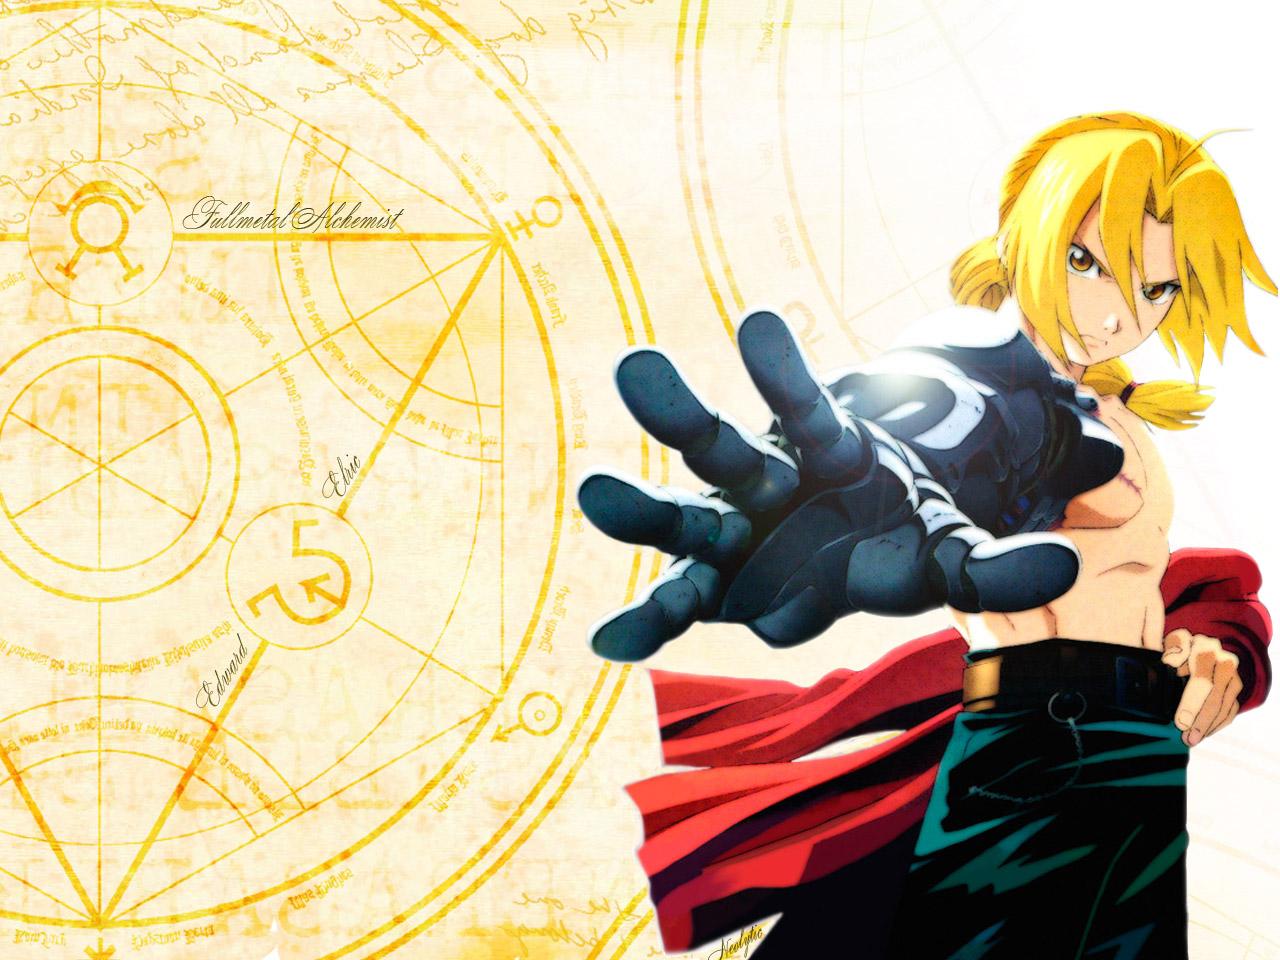 Manga And Anime Wallpapers Fullmetal Alchemist HD Wallpaper 1280x960